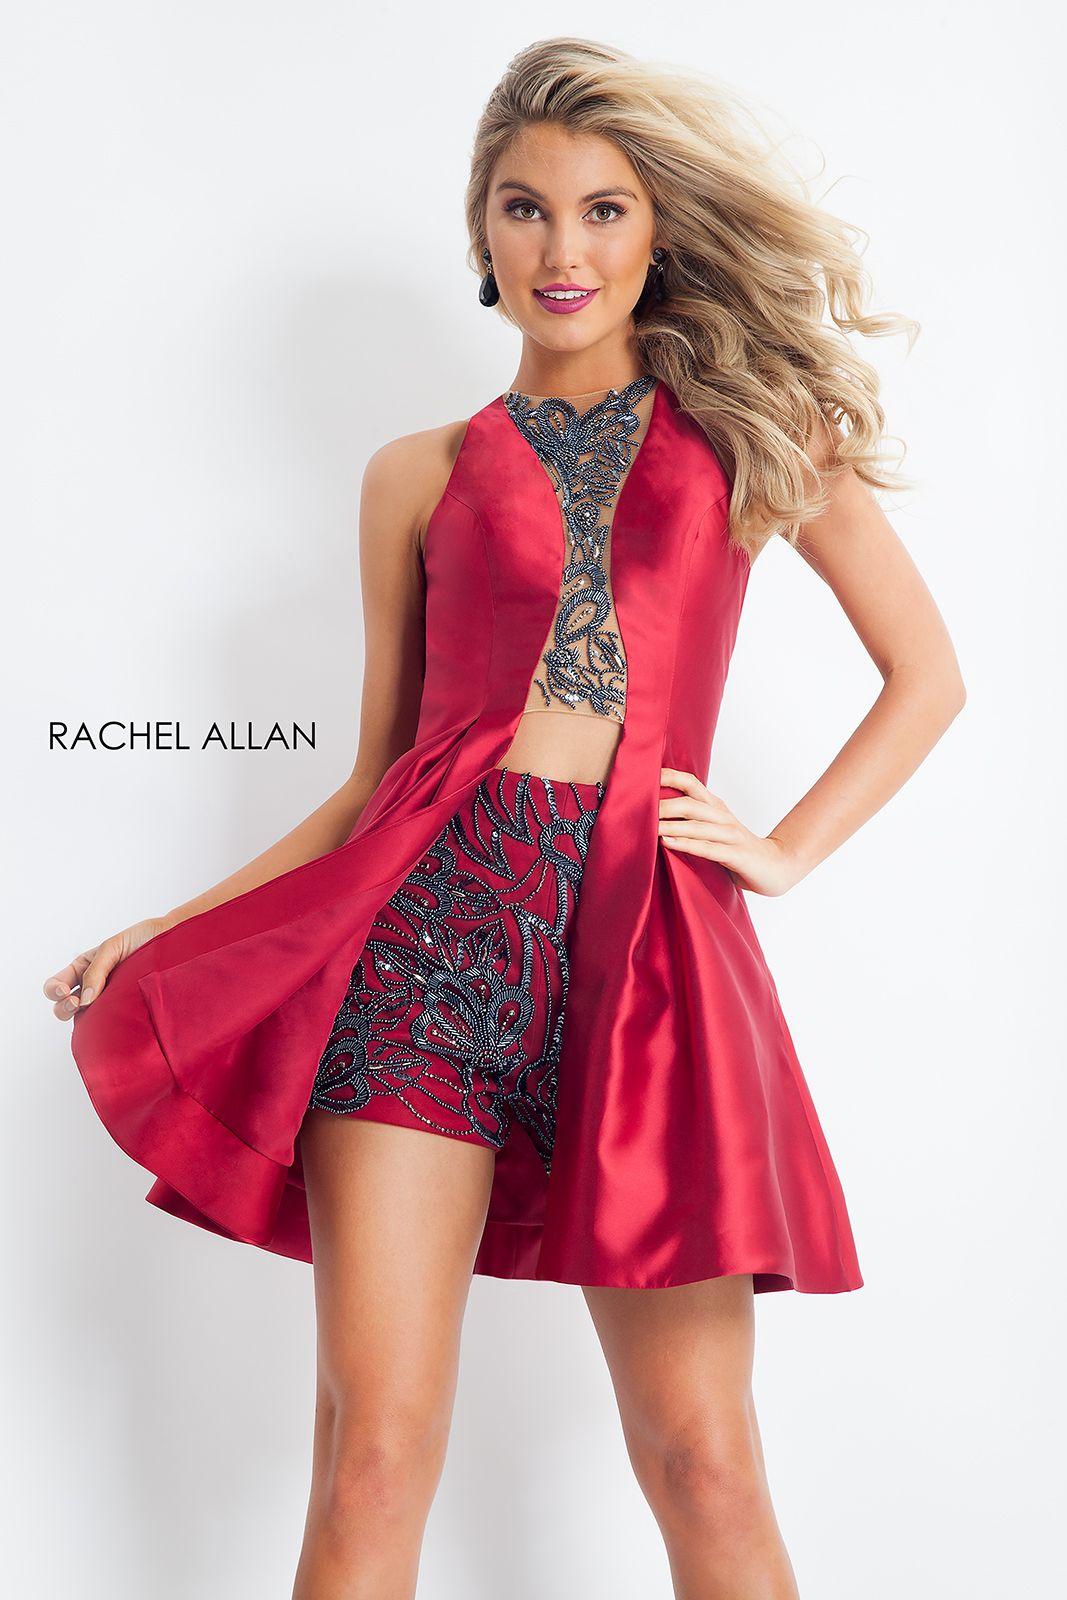 Homecoming Dress  4650 in Marsala  homecomingdress  twopiecedress  romper